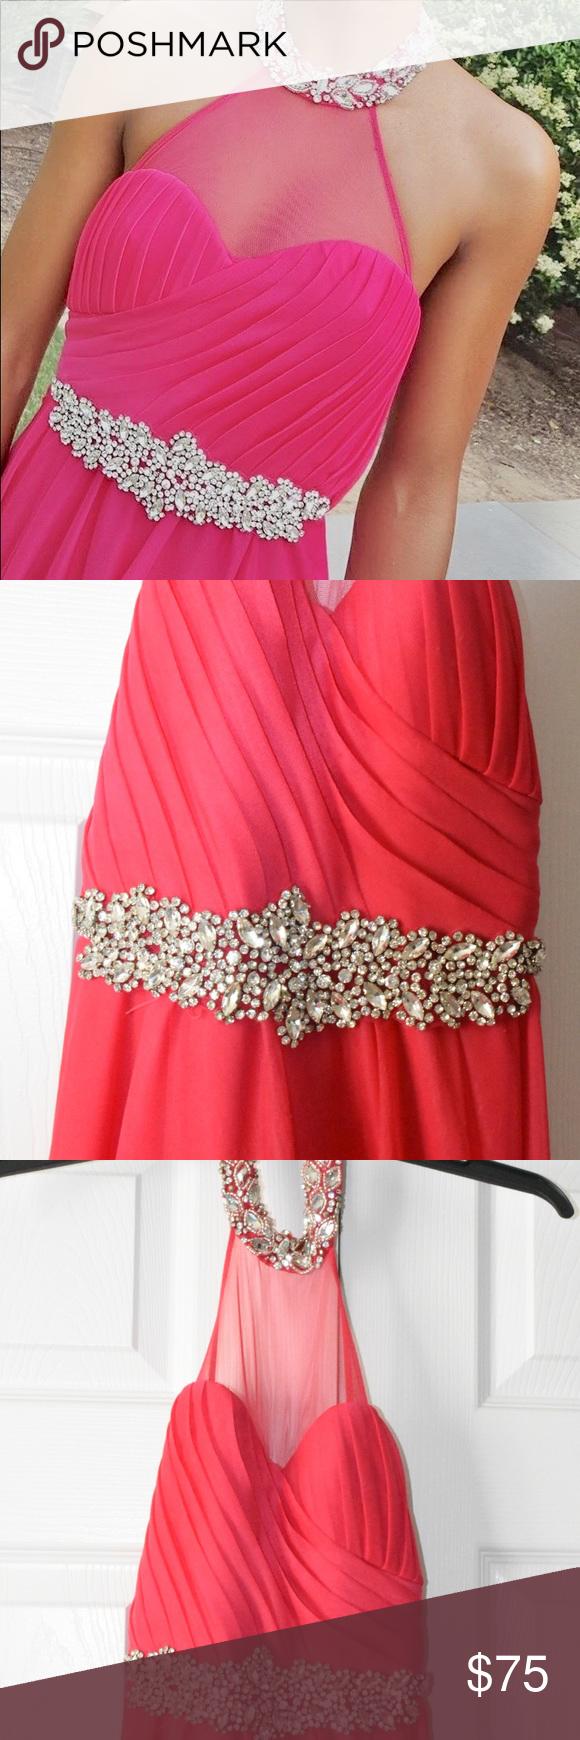 Hot pink prom dress size juniorus my michelle prom dress size